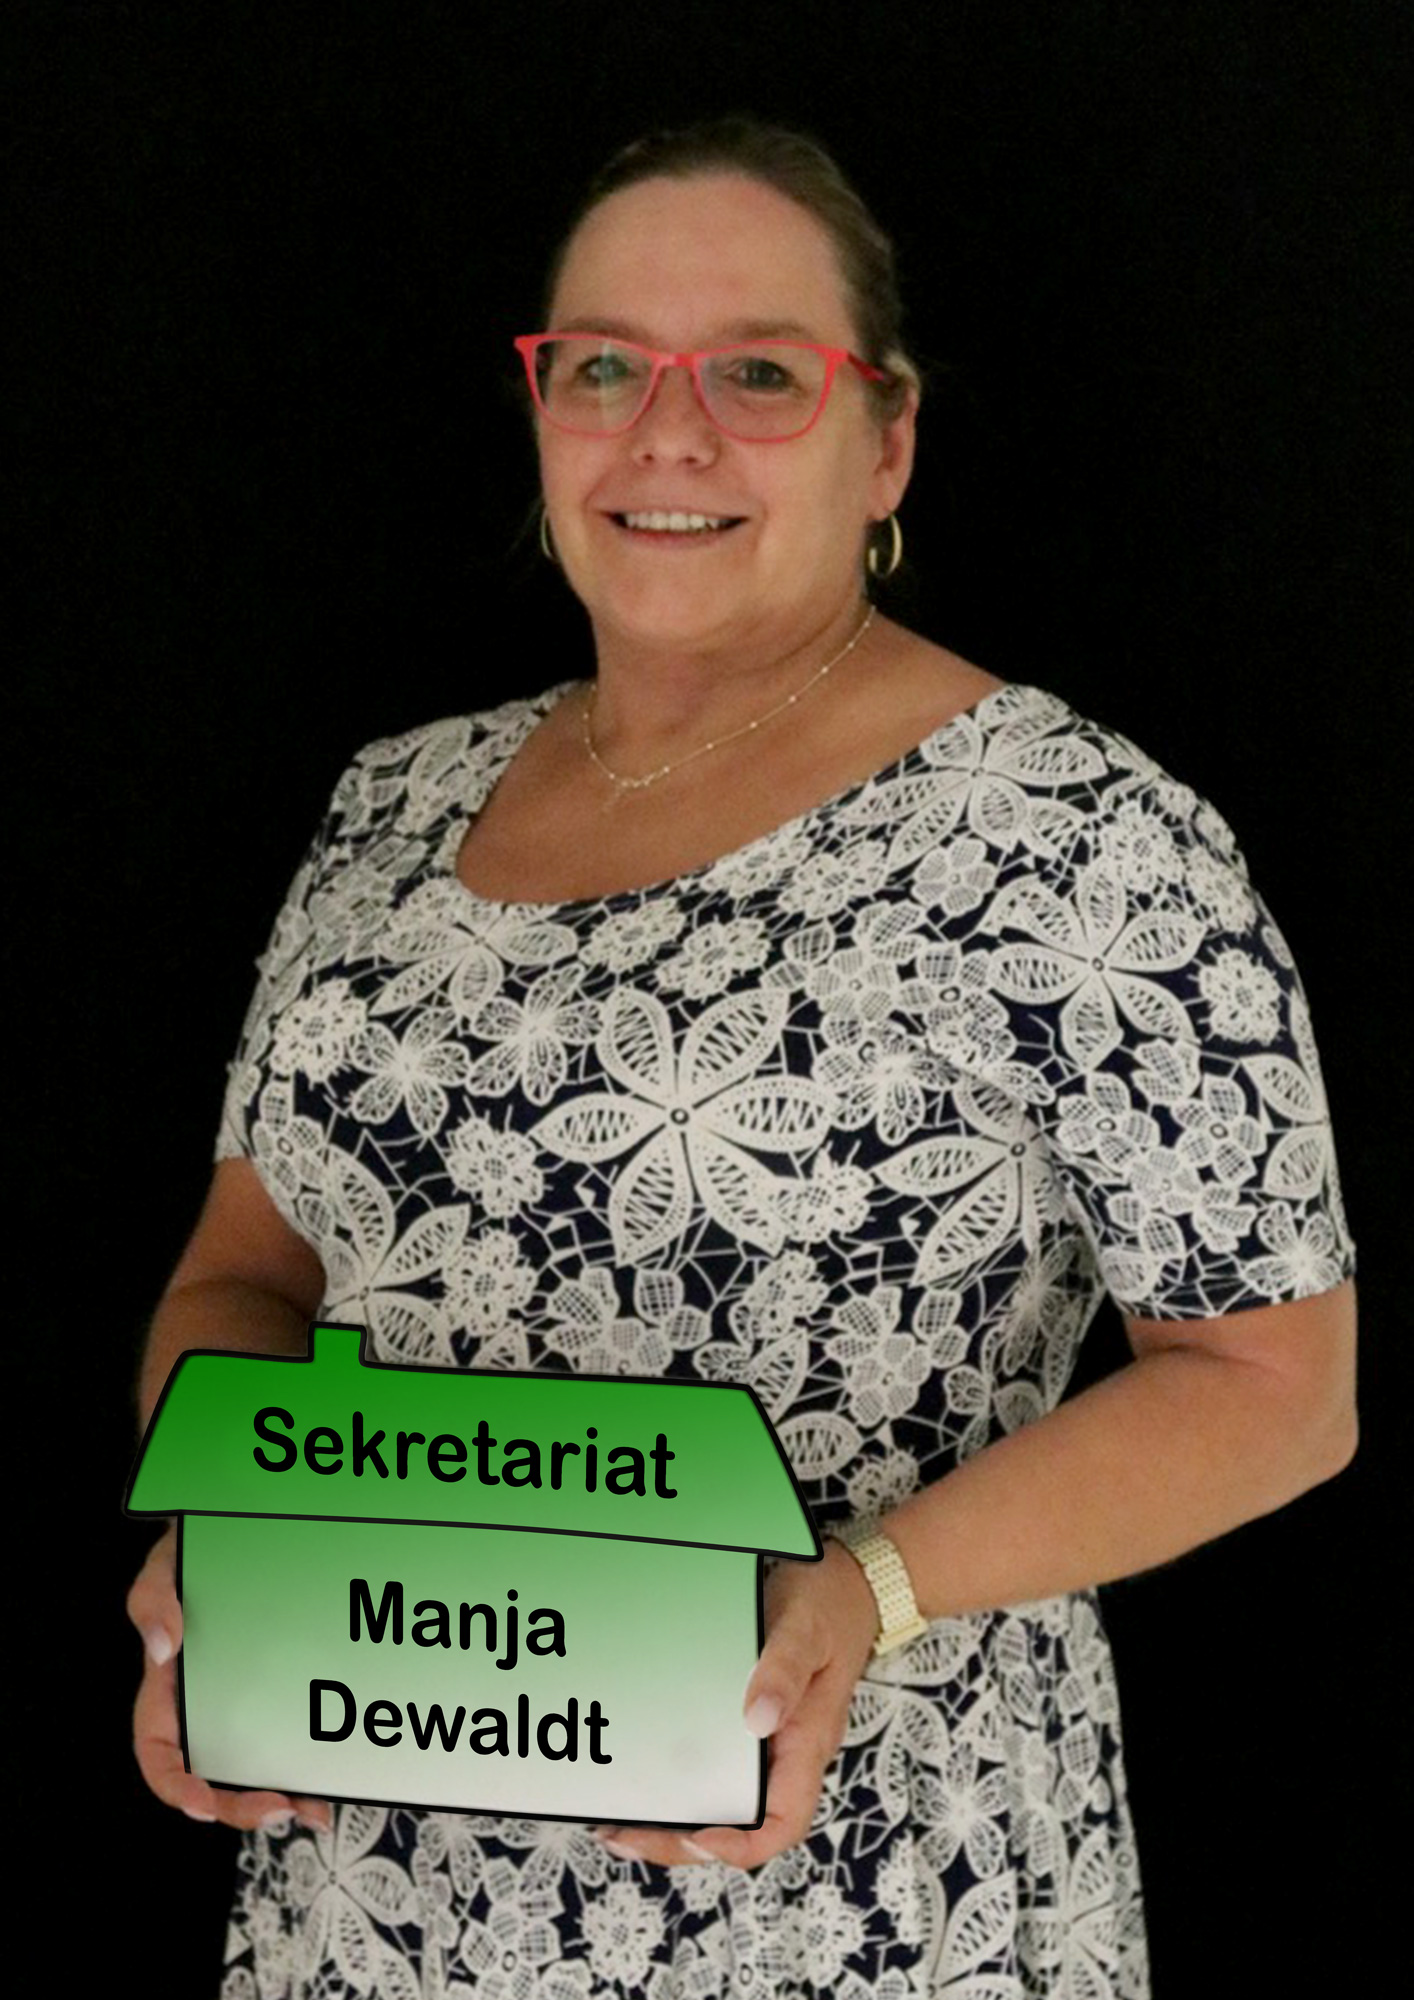 Sekretariat Manja Dewaldt